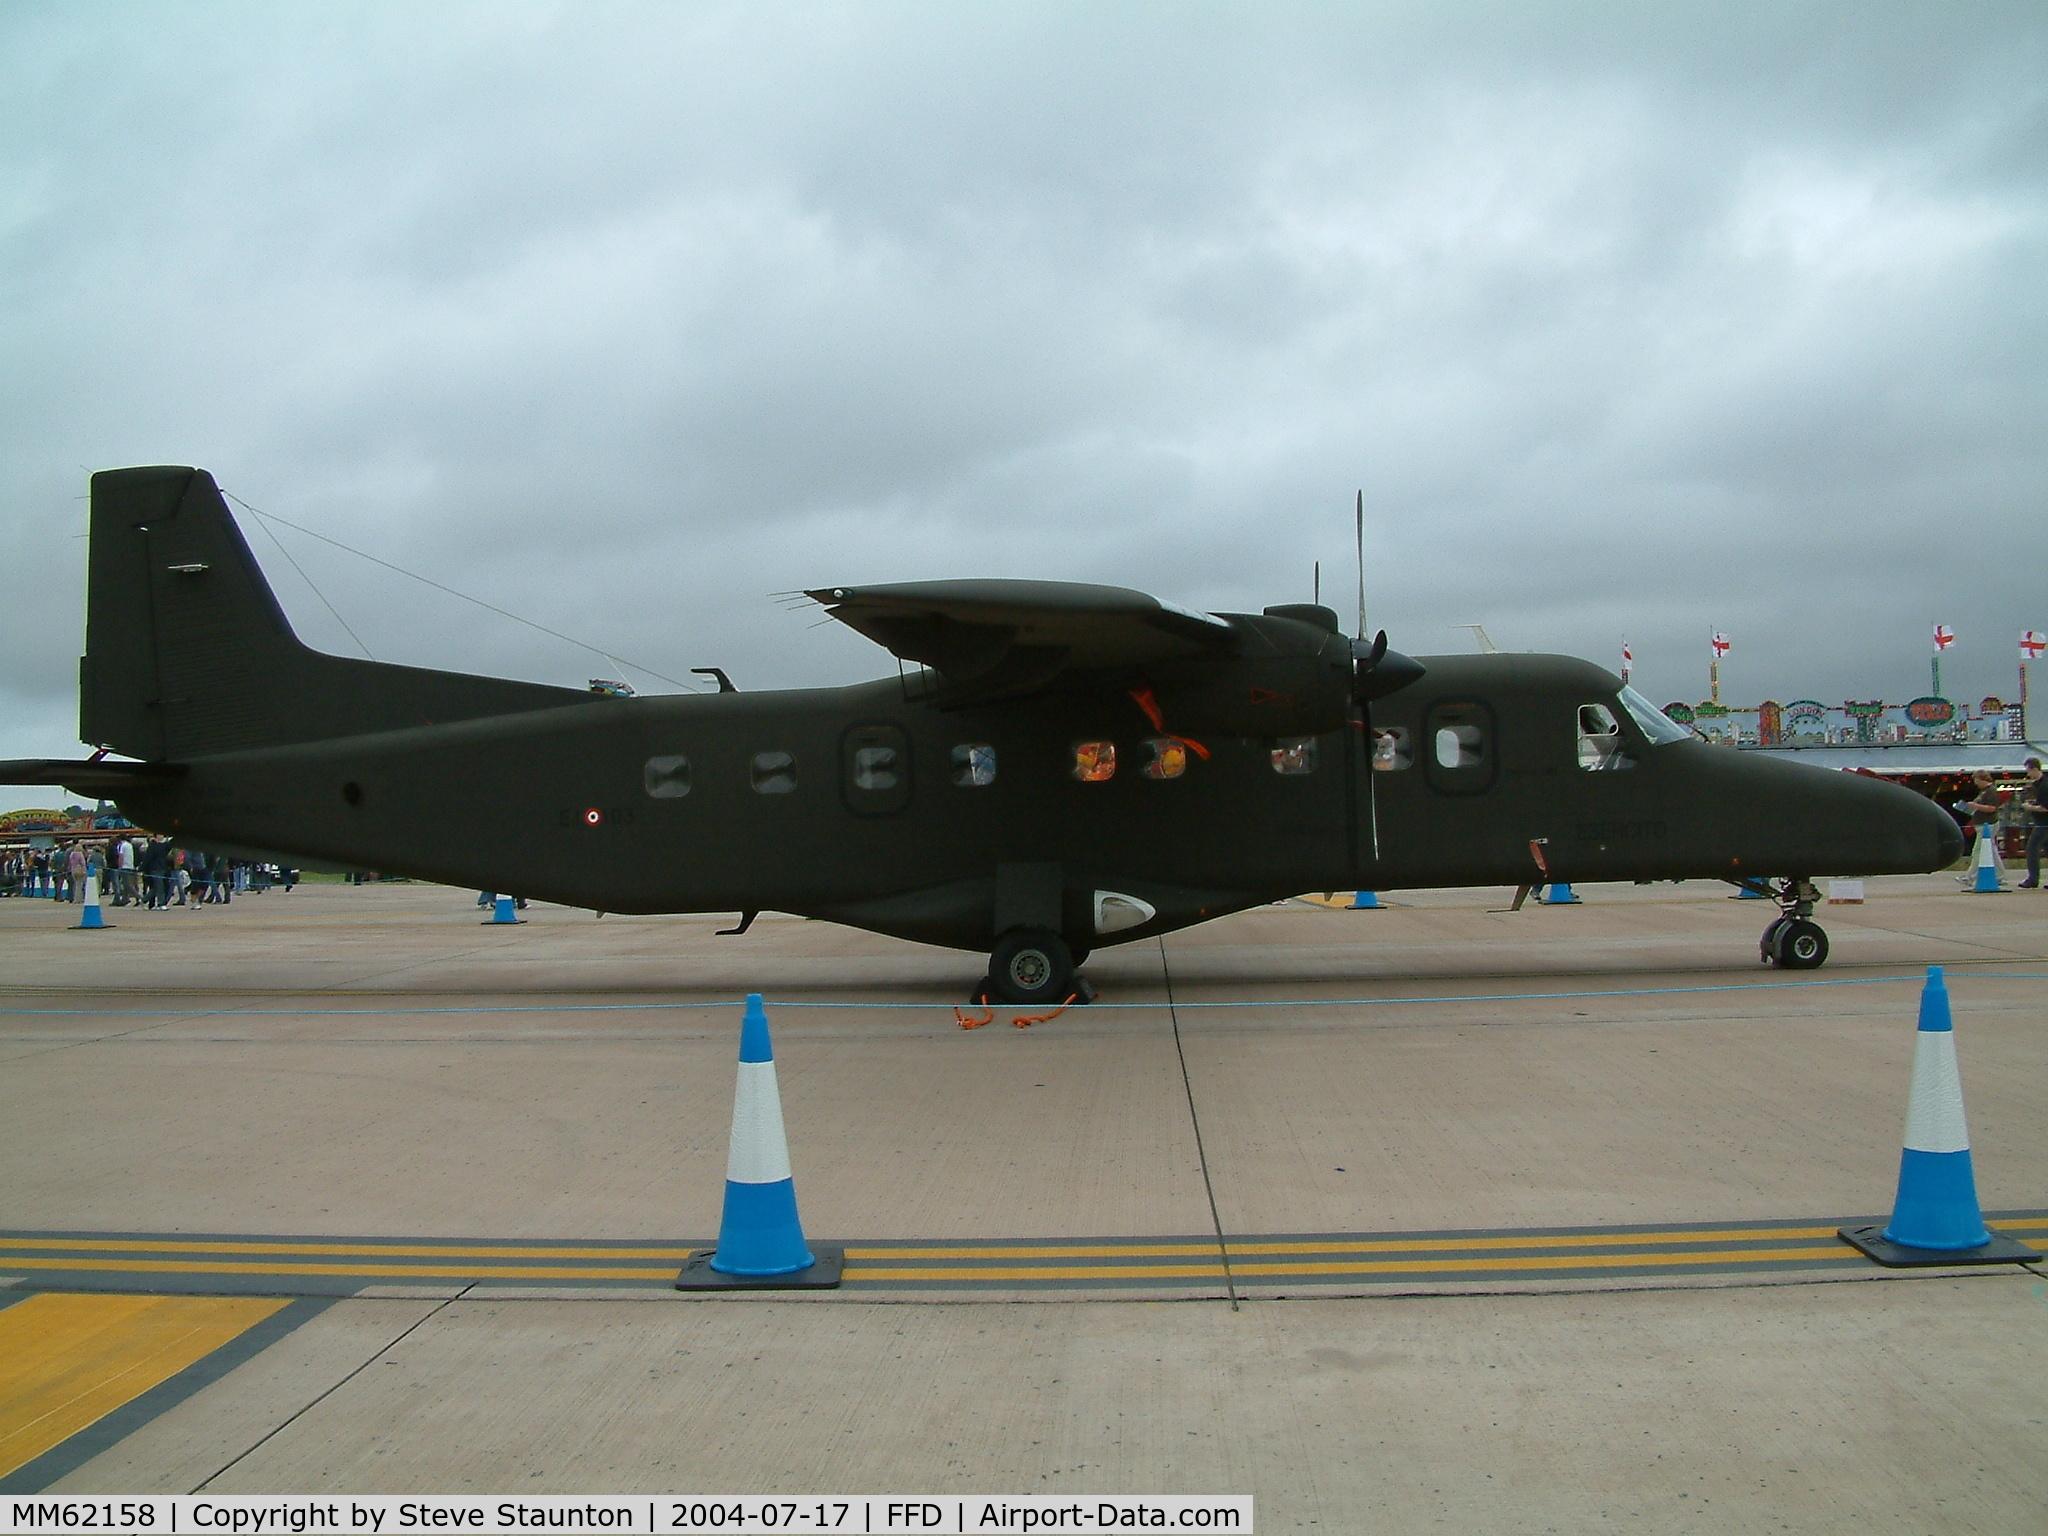 MM62158, 1992 Dornier 228-212 C/N 8209, Royal International Air Tattoo 2004